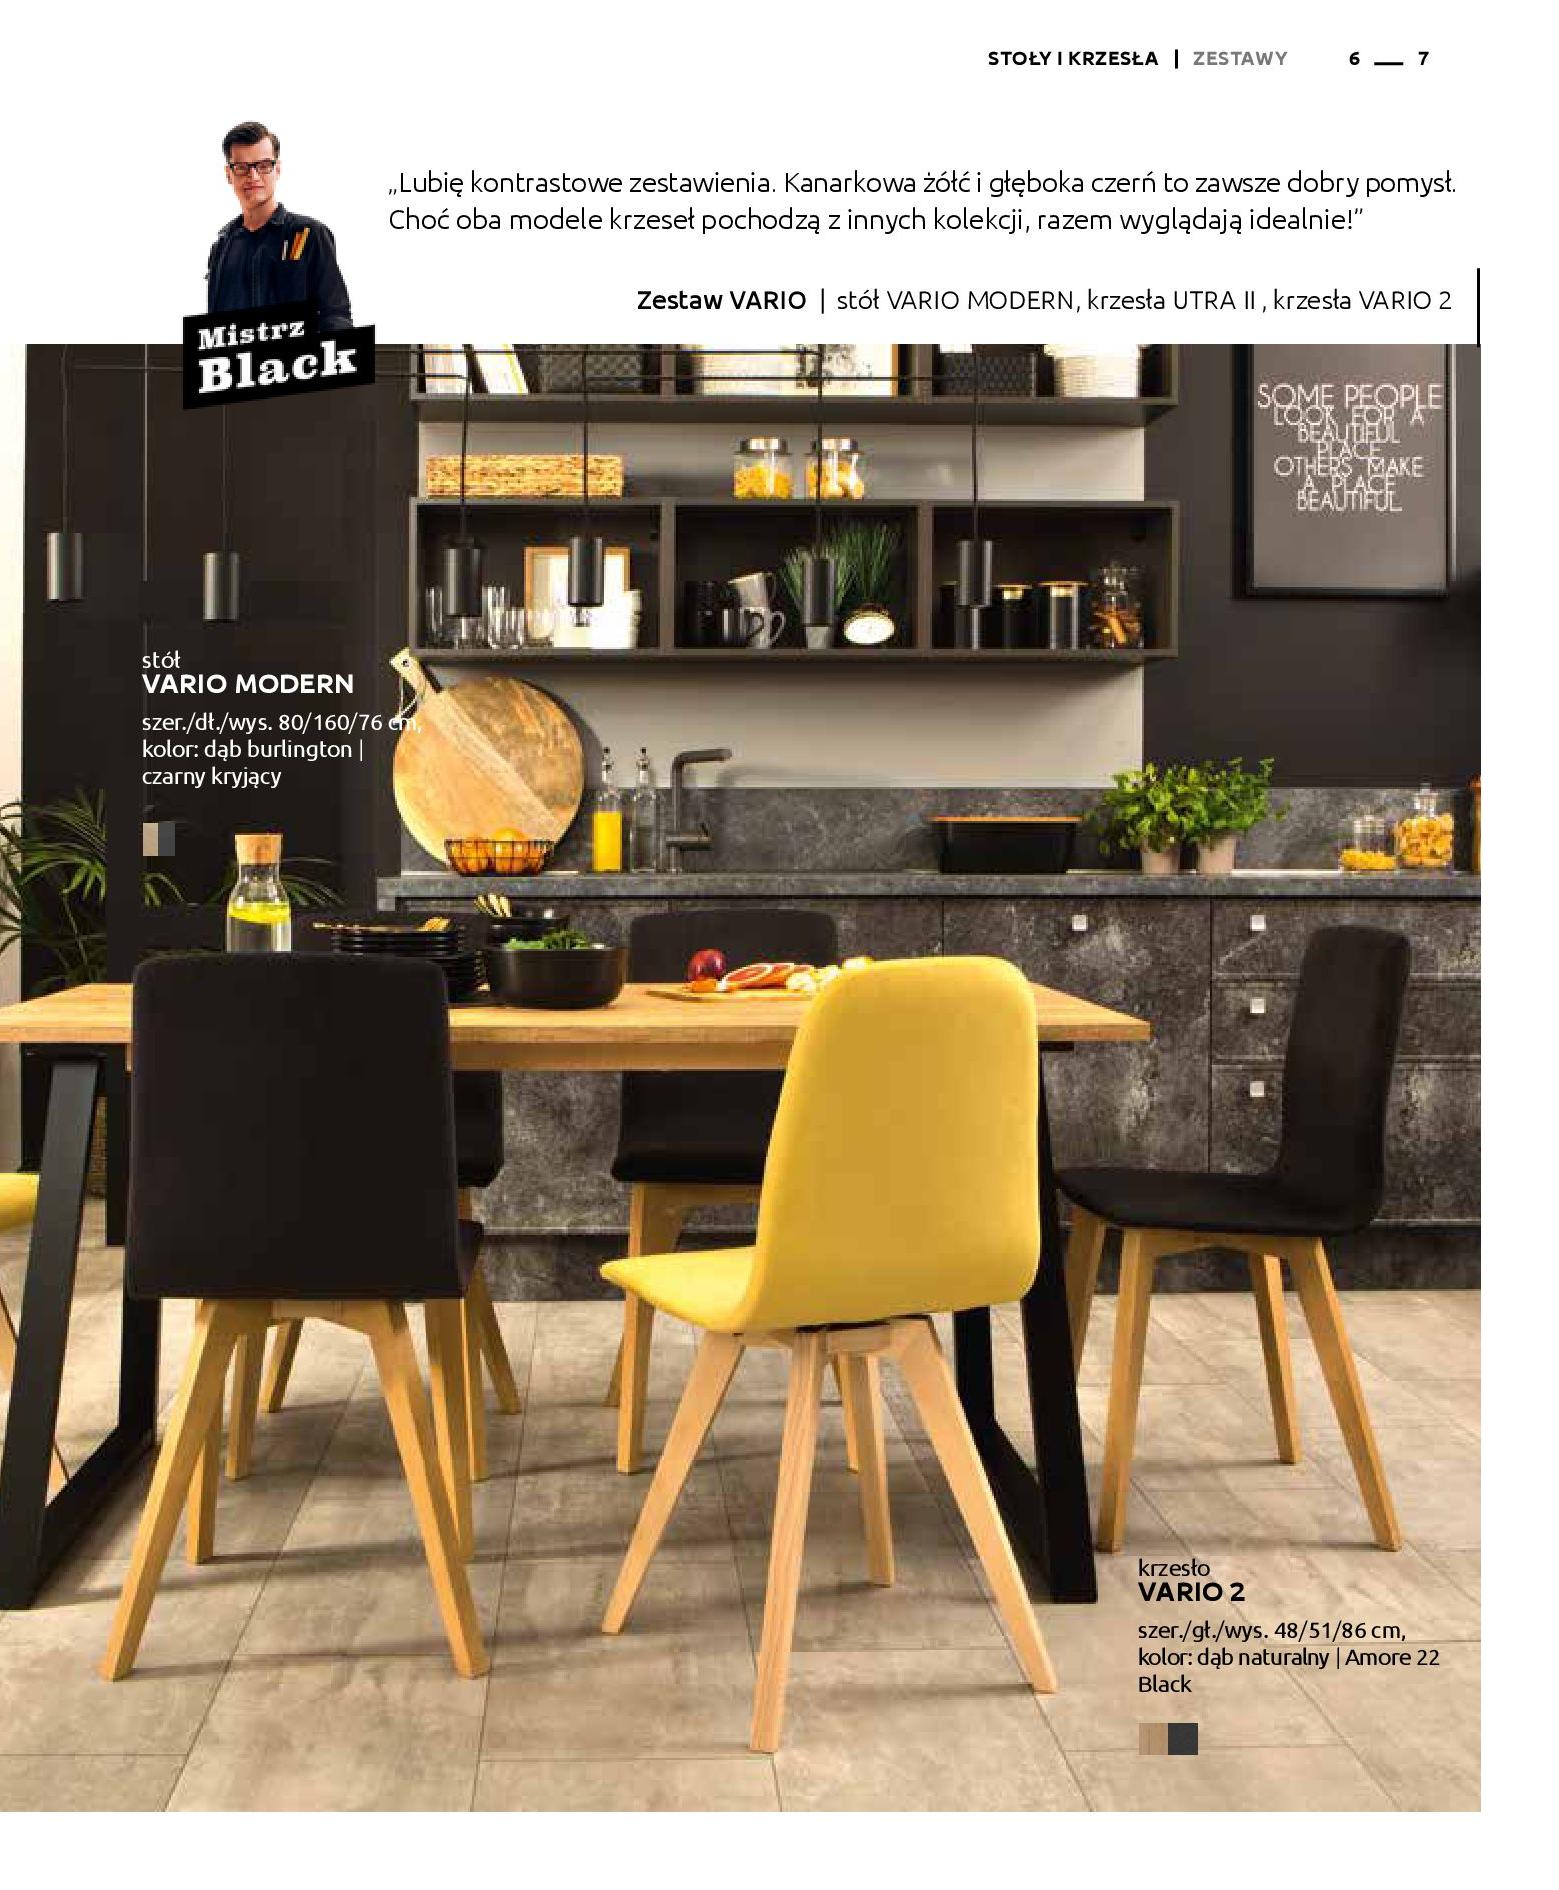 Gazetka Black Red White: Katalog - Stoły i krzesła 2019-05-01 page-7